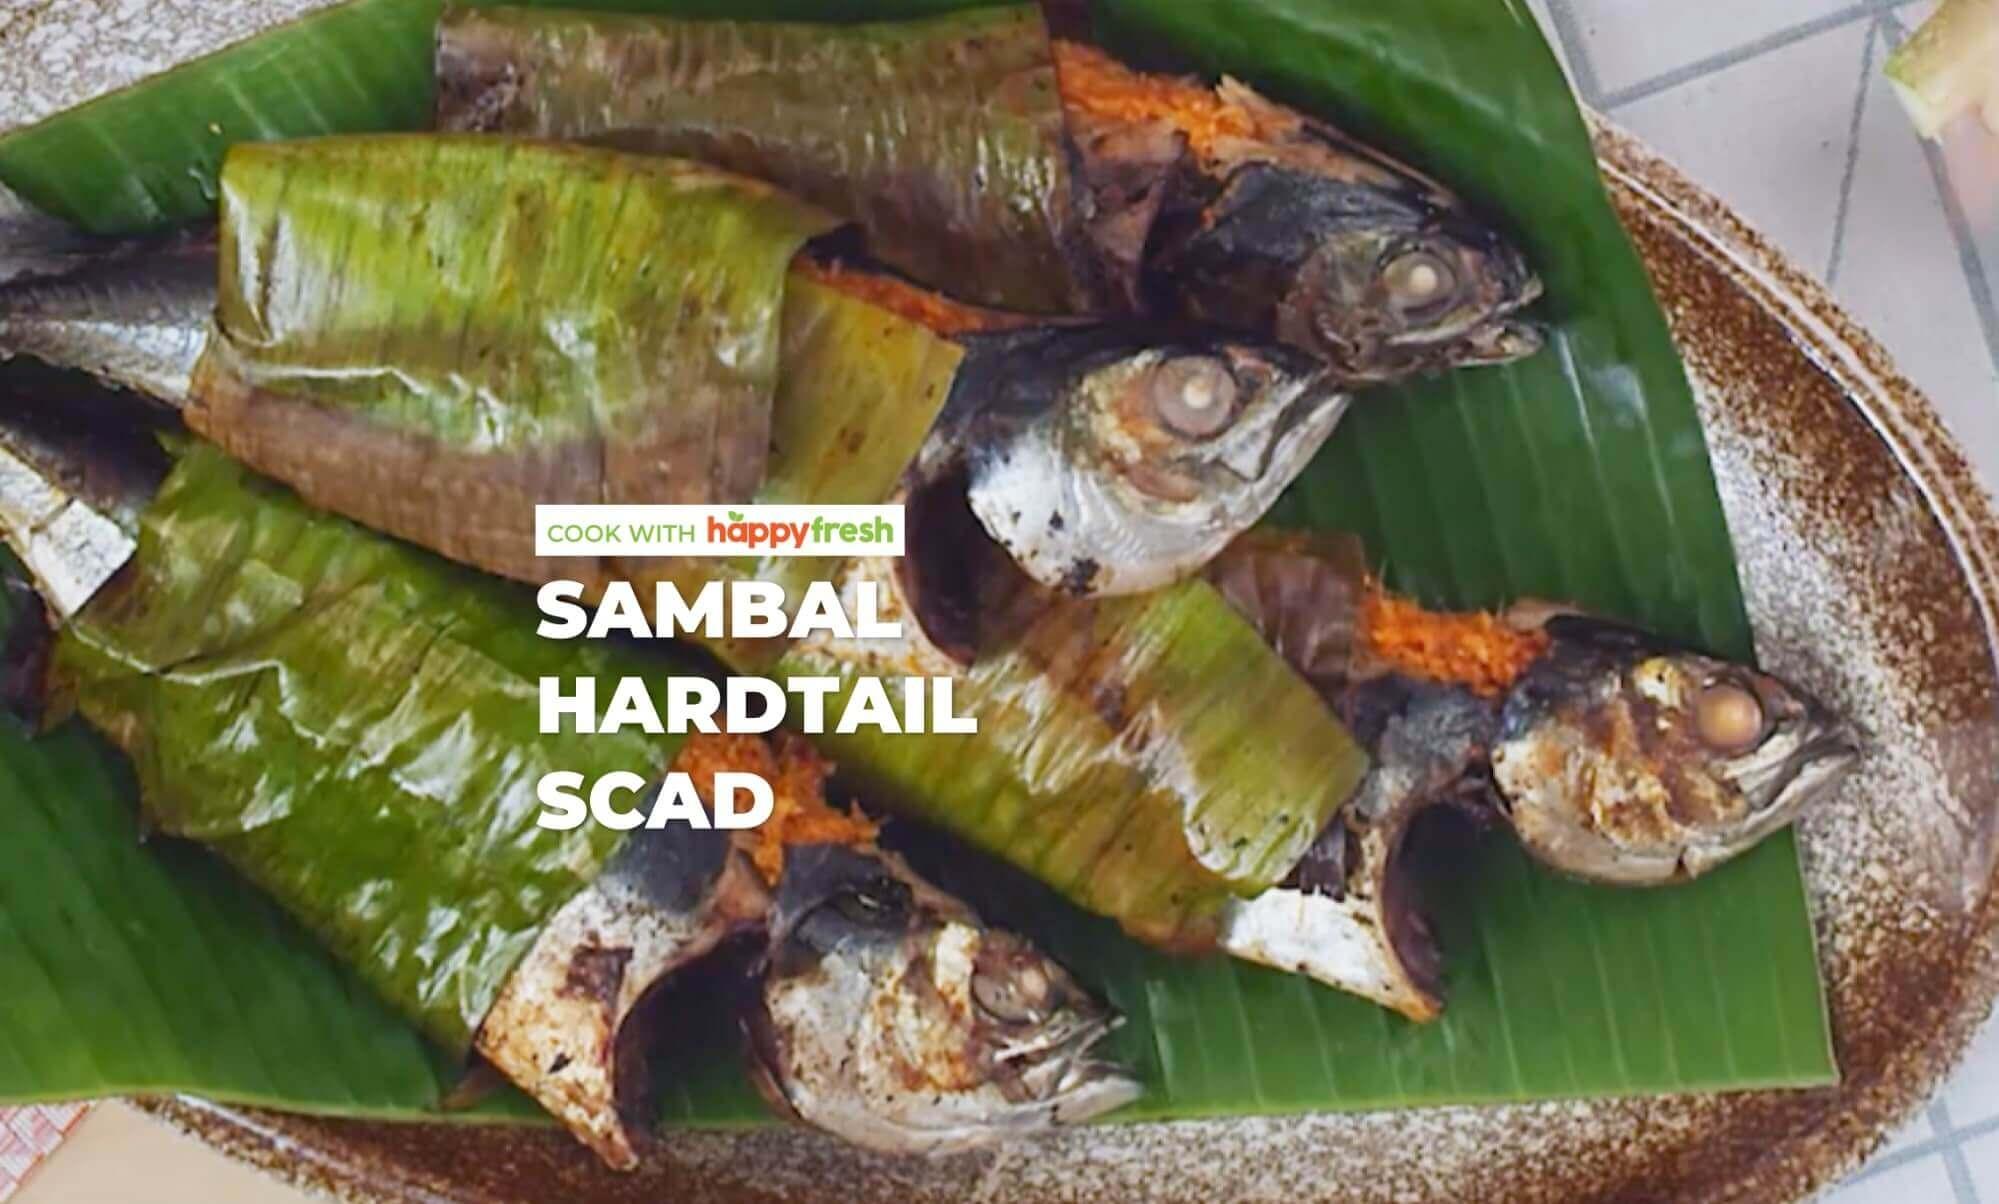 Sambal Hardtail Scad (Cencaru Fish) recipe